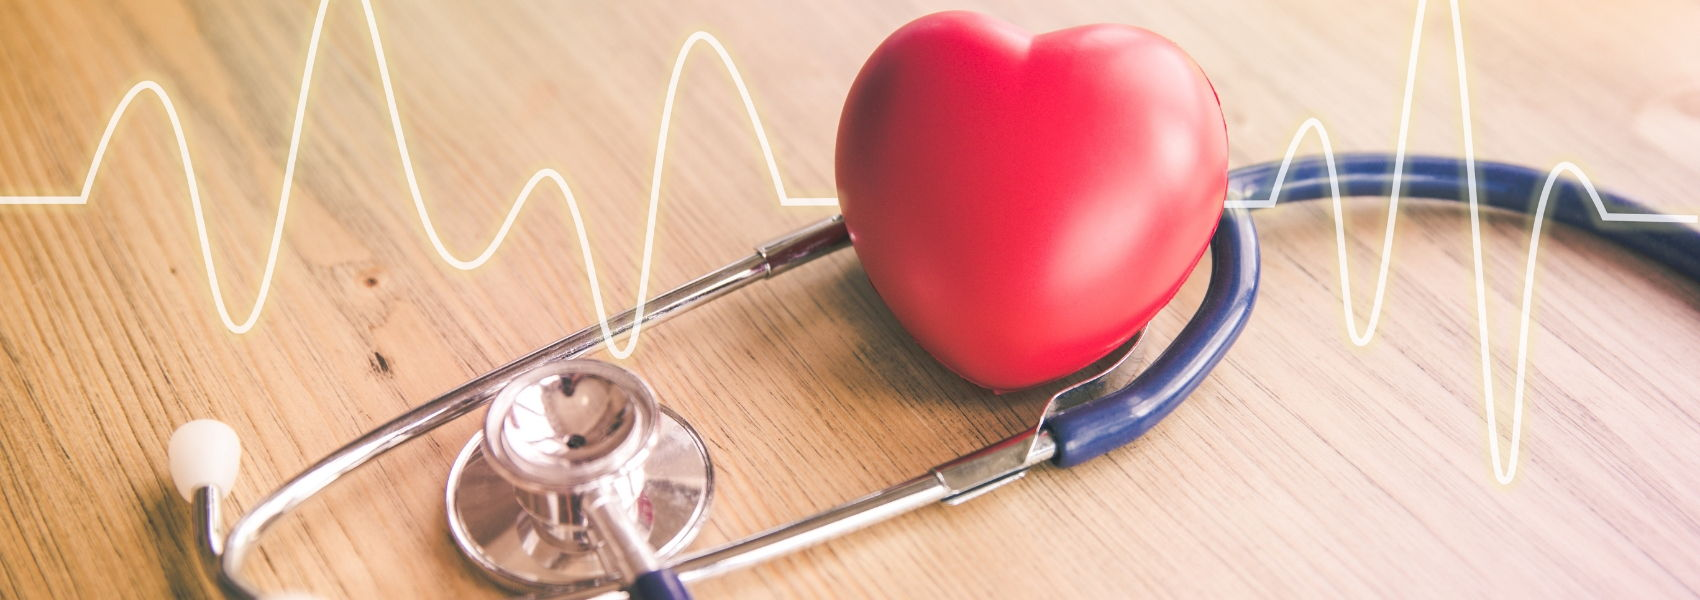 custo de enfartes ou AVC